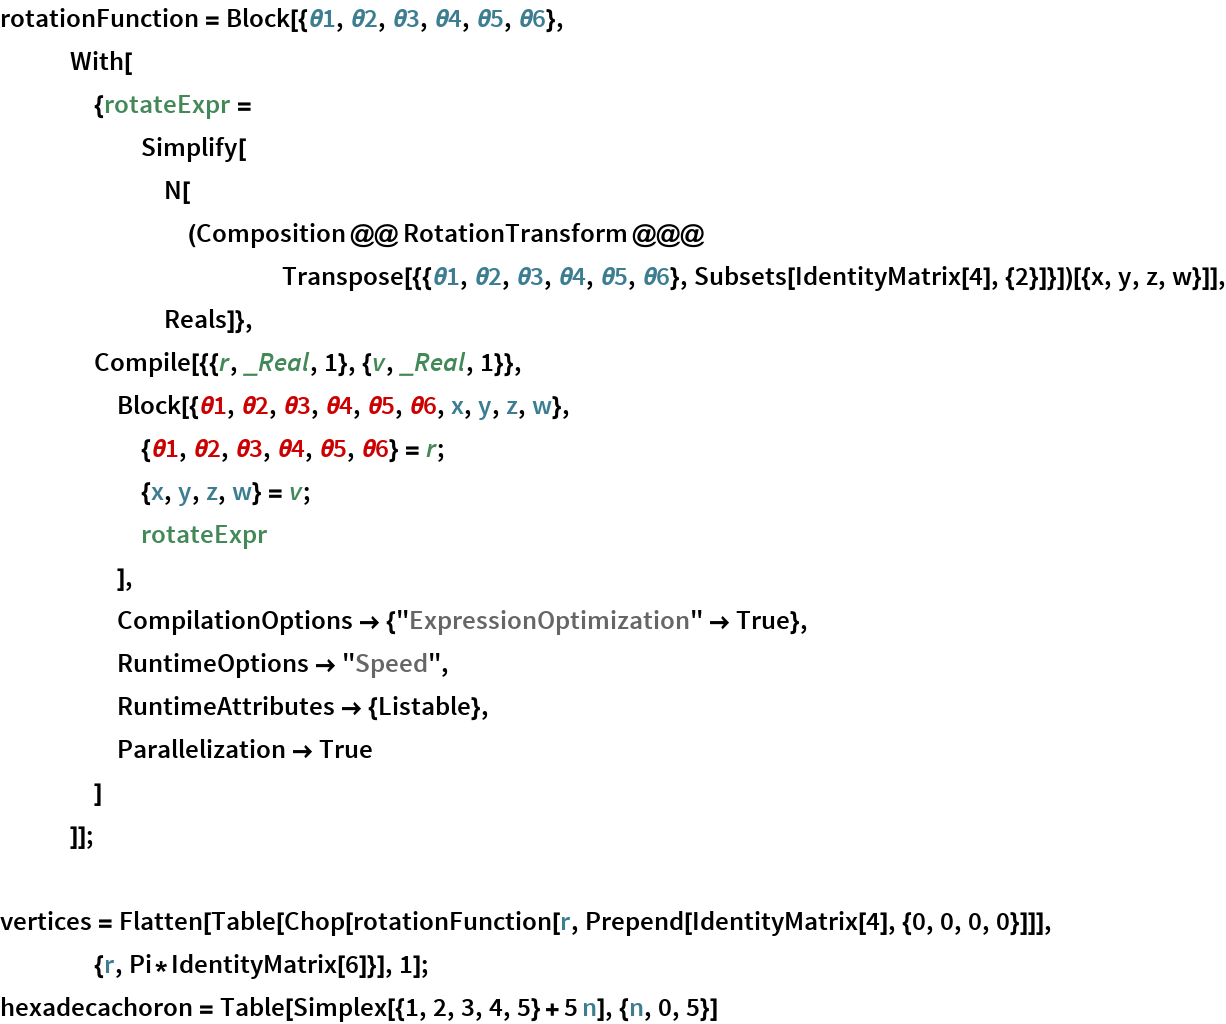 "rotationFunction = Block[{\[Theta]1, \[Theta]2, \[Theta]3, \[Theta]4, \[Theta]5, \ \[Theta]6}, With[{rotateExpr = Simplify[        N[(Composition @@ RotationTransform @@@ Transpose[{{\[Theta]1, \[Theta]2, \[Theta]3, \[Theta]4, \ \[Theta]5, \[Theta]6}, Subsets[IdentityMatrix[4], {2}]}])[{x, y, z, w}]], Reals]},     Compile[{{r, _Real, 1}, {v, _Real, 1}},      Block[{\[Theta]1, \[Theta]2, \[Theta]3, \[Theta]4, \[Theta]5, \ \[Theta]6, x, y, z, w},       {\[Theta]1, \[Theta]2, \[Theta]3, \[Theta]4, \[Theta]5, \ \[Theta]6} = r;       {x, y, z, w} = v;       rotateExpr       ],      CompilationOptions -> {""ExpressionOptimization"" -> True},      RuntimeOptions -> ""Speed"",      RuntimeAttributes -> {Listable},      Parallelization -> True      ]     ]];  vertices = Flatten[Table[     Chop[rotationFunction[r, Prepend[IdentityMatrix[4], {0, 0, 0, 0}]]], {r, Pi*IdentityMatrix[6]}], 1]; hexadecachoron = Table[Simplex[{1, 2, 3, 4, 5} + 5 n], {n, 0, 5}]"